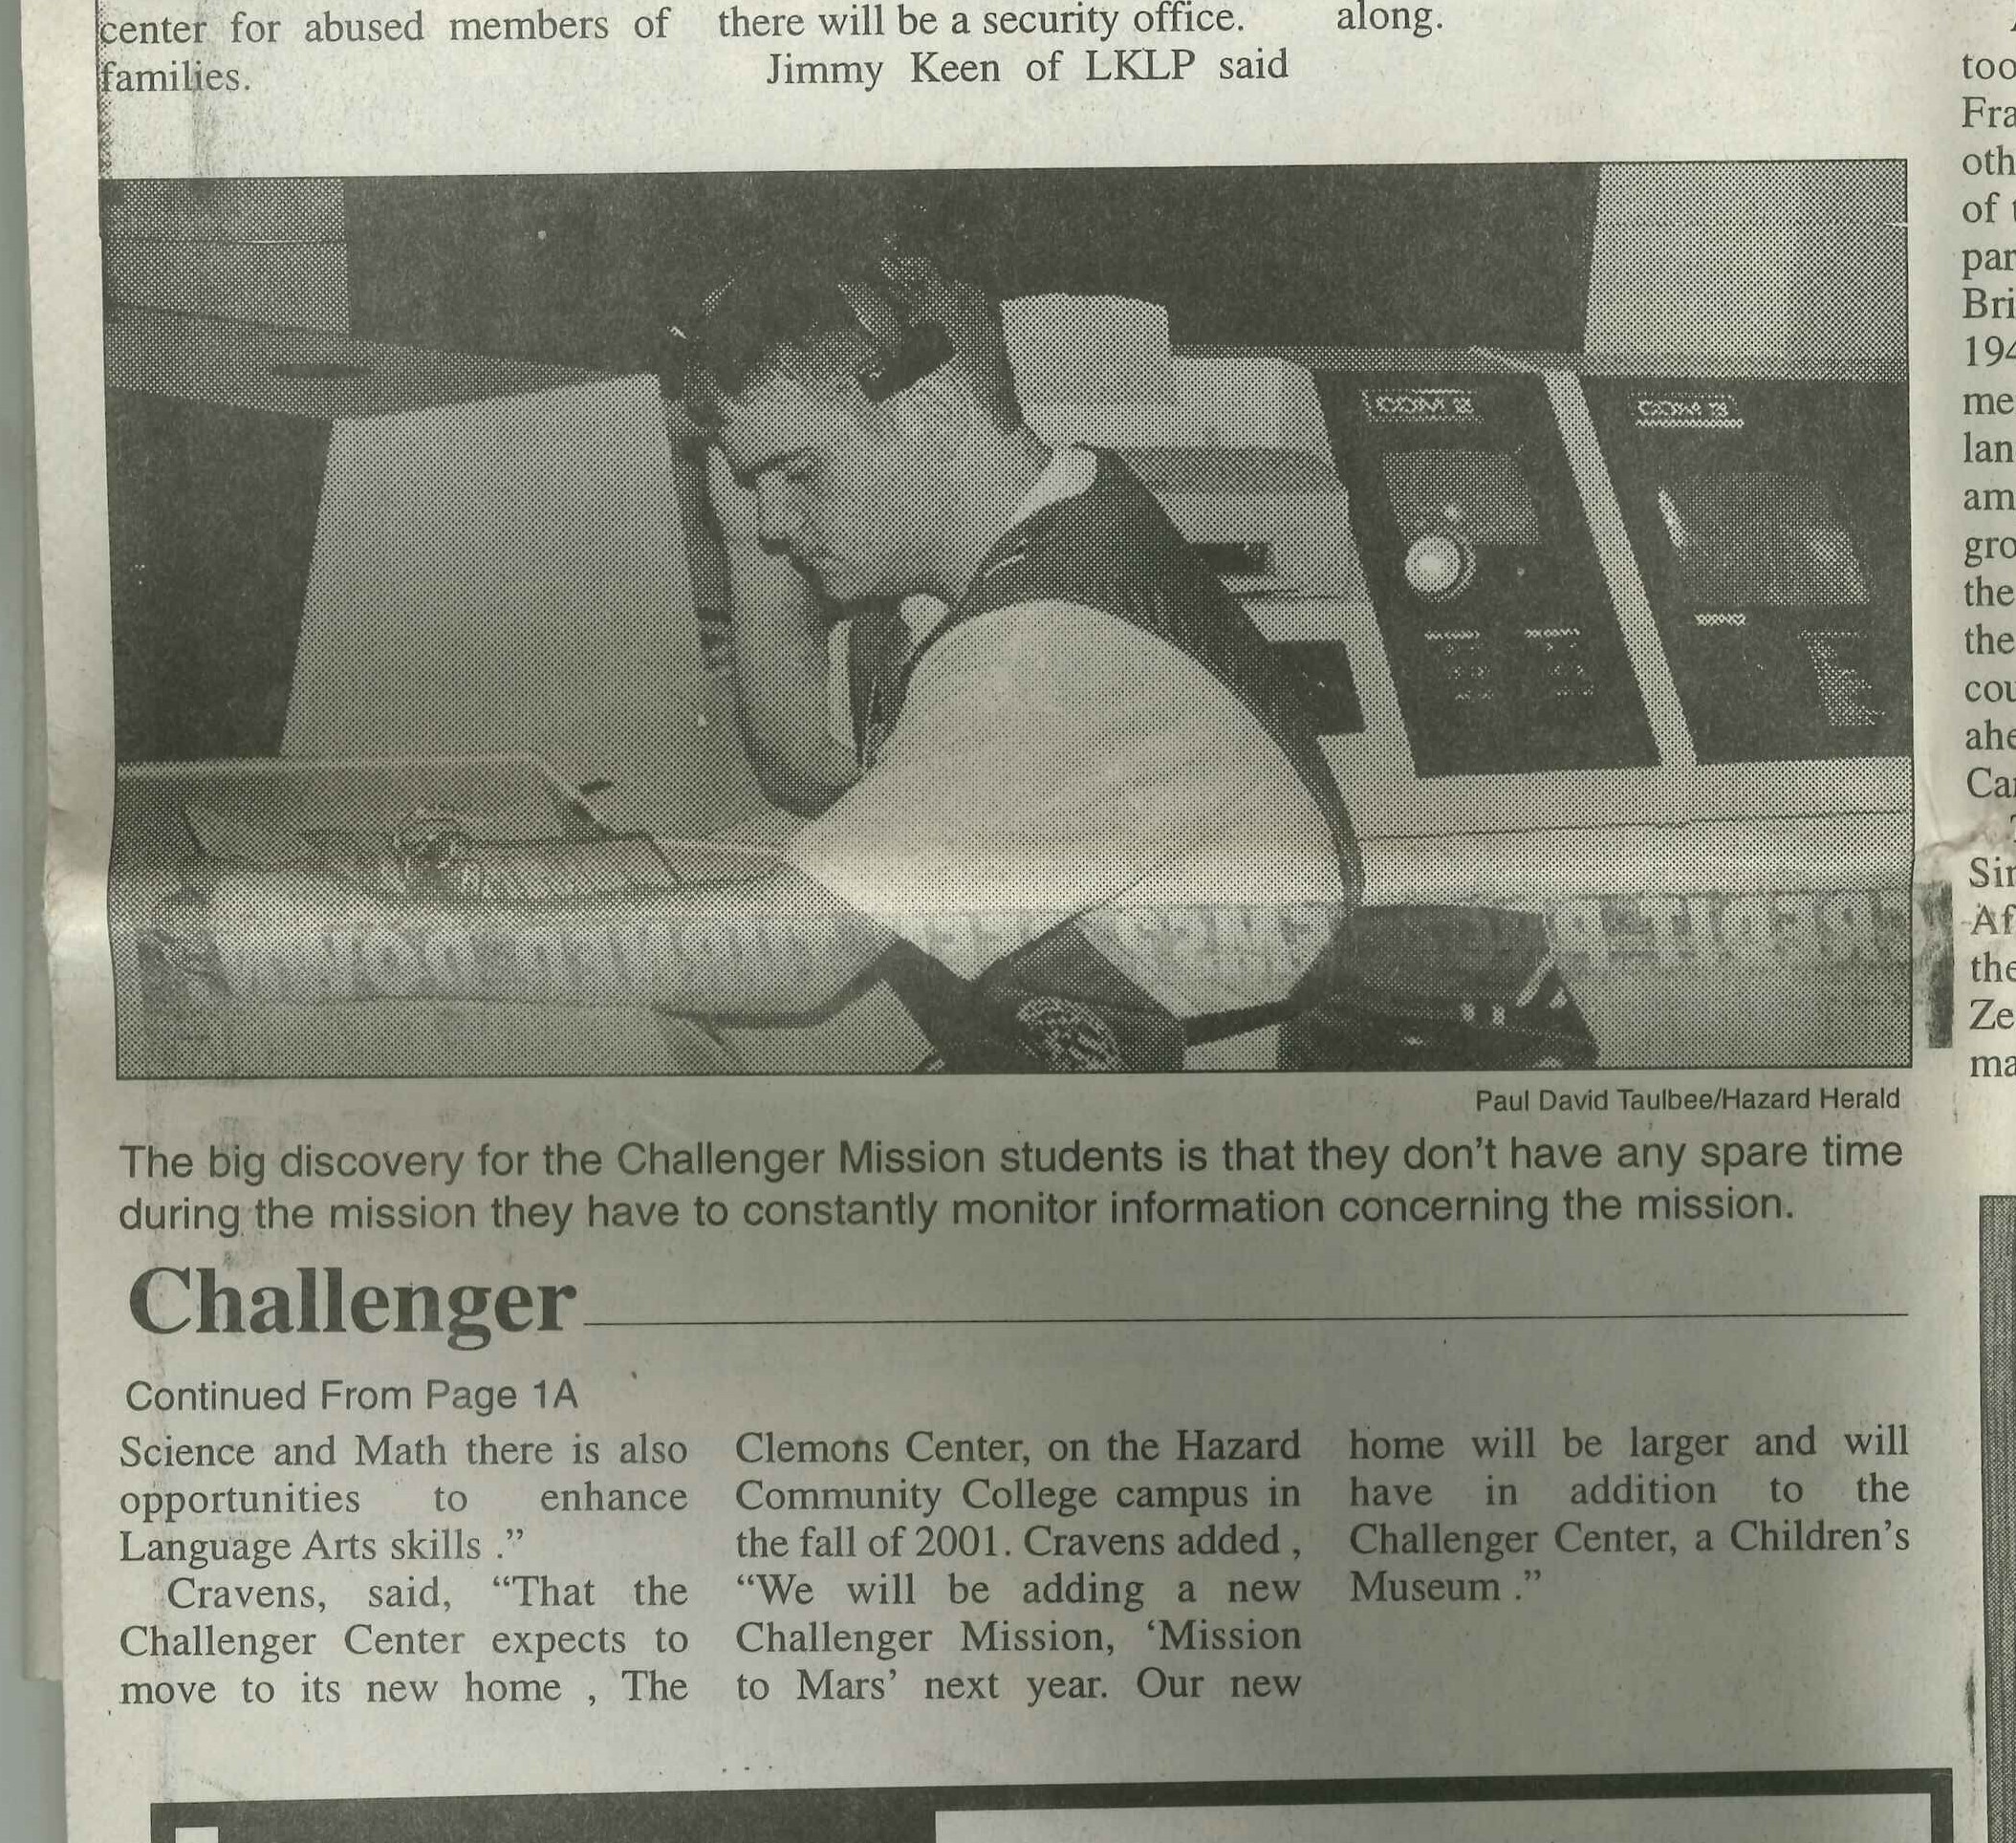 2000-03-15 Hazard Herald Cumberland Middle School flies Challenger Mission 279 continued.jpg